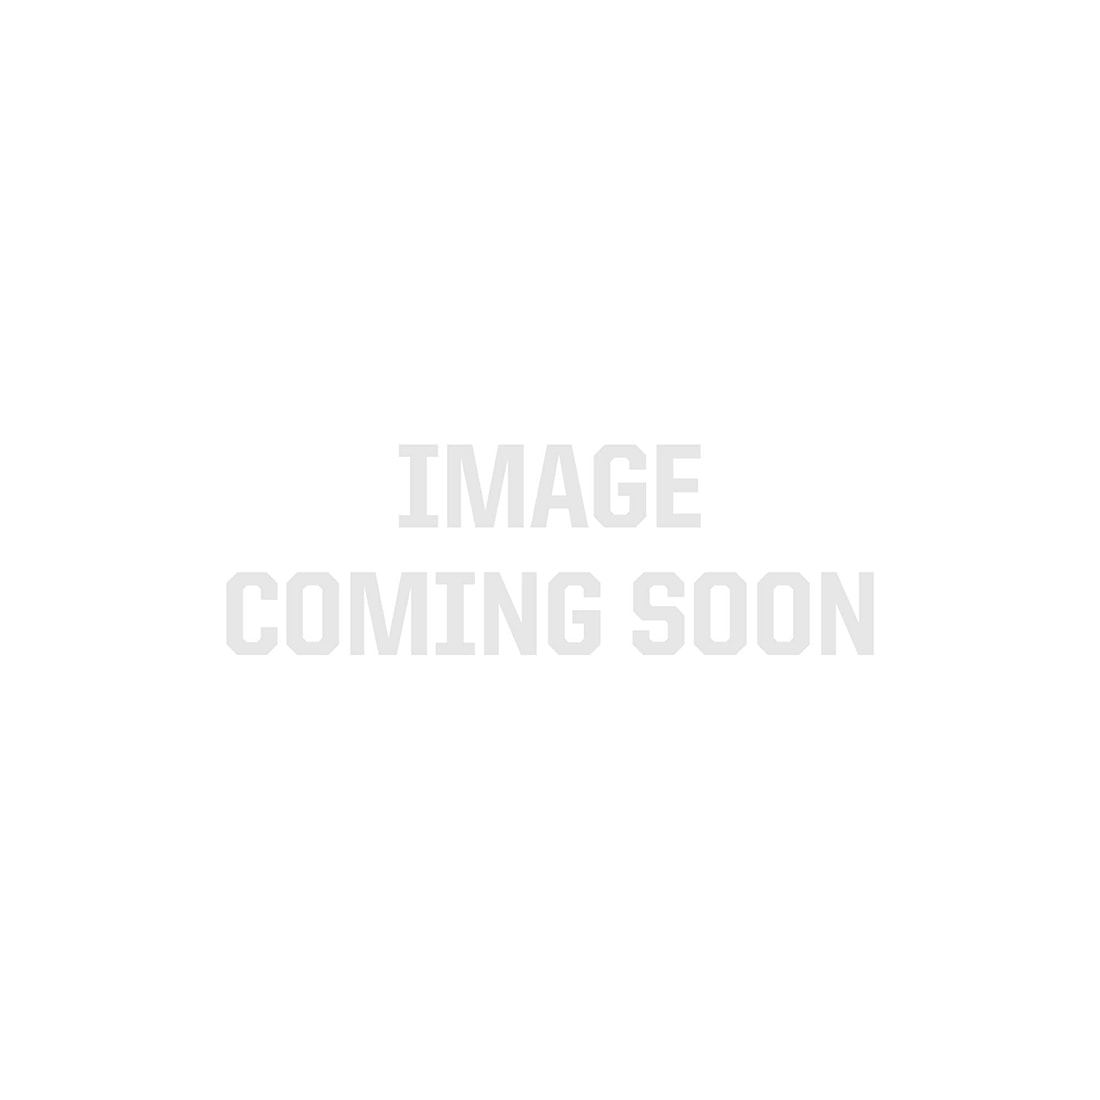 6-in-1 ColorPlus 5050 LED Strip Light – RGB + Amber + Tunable White - 60/m - Sample Kit